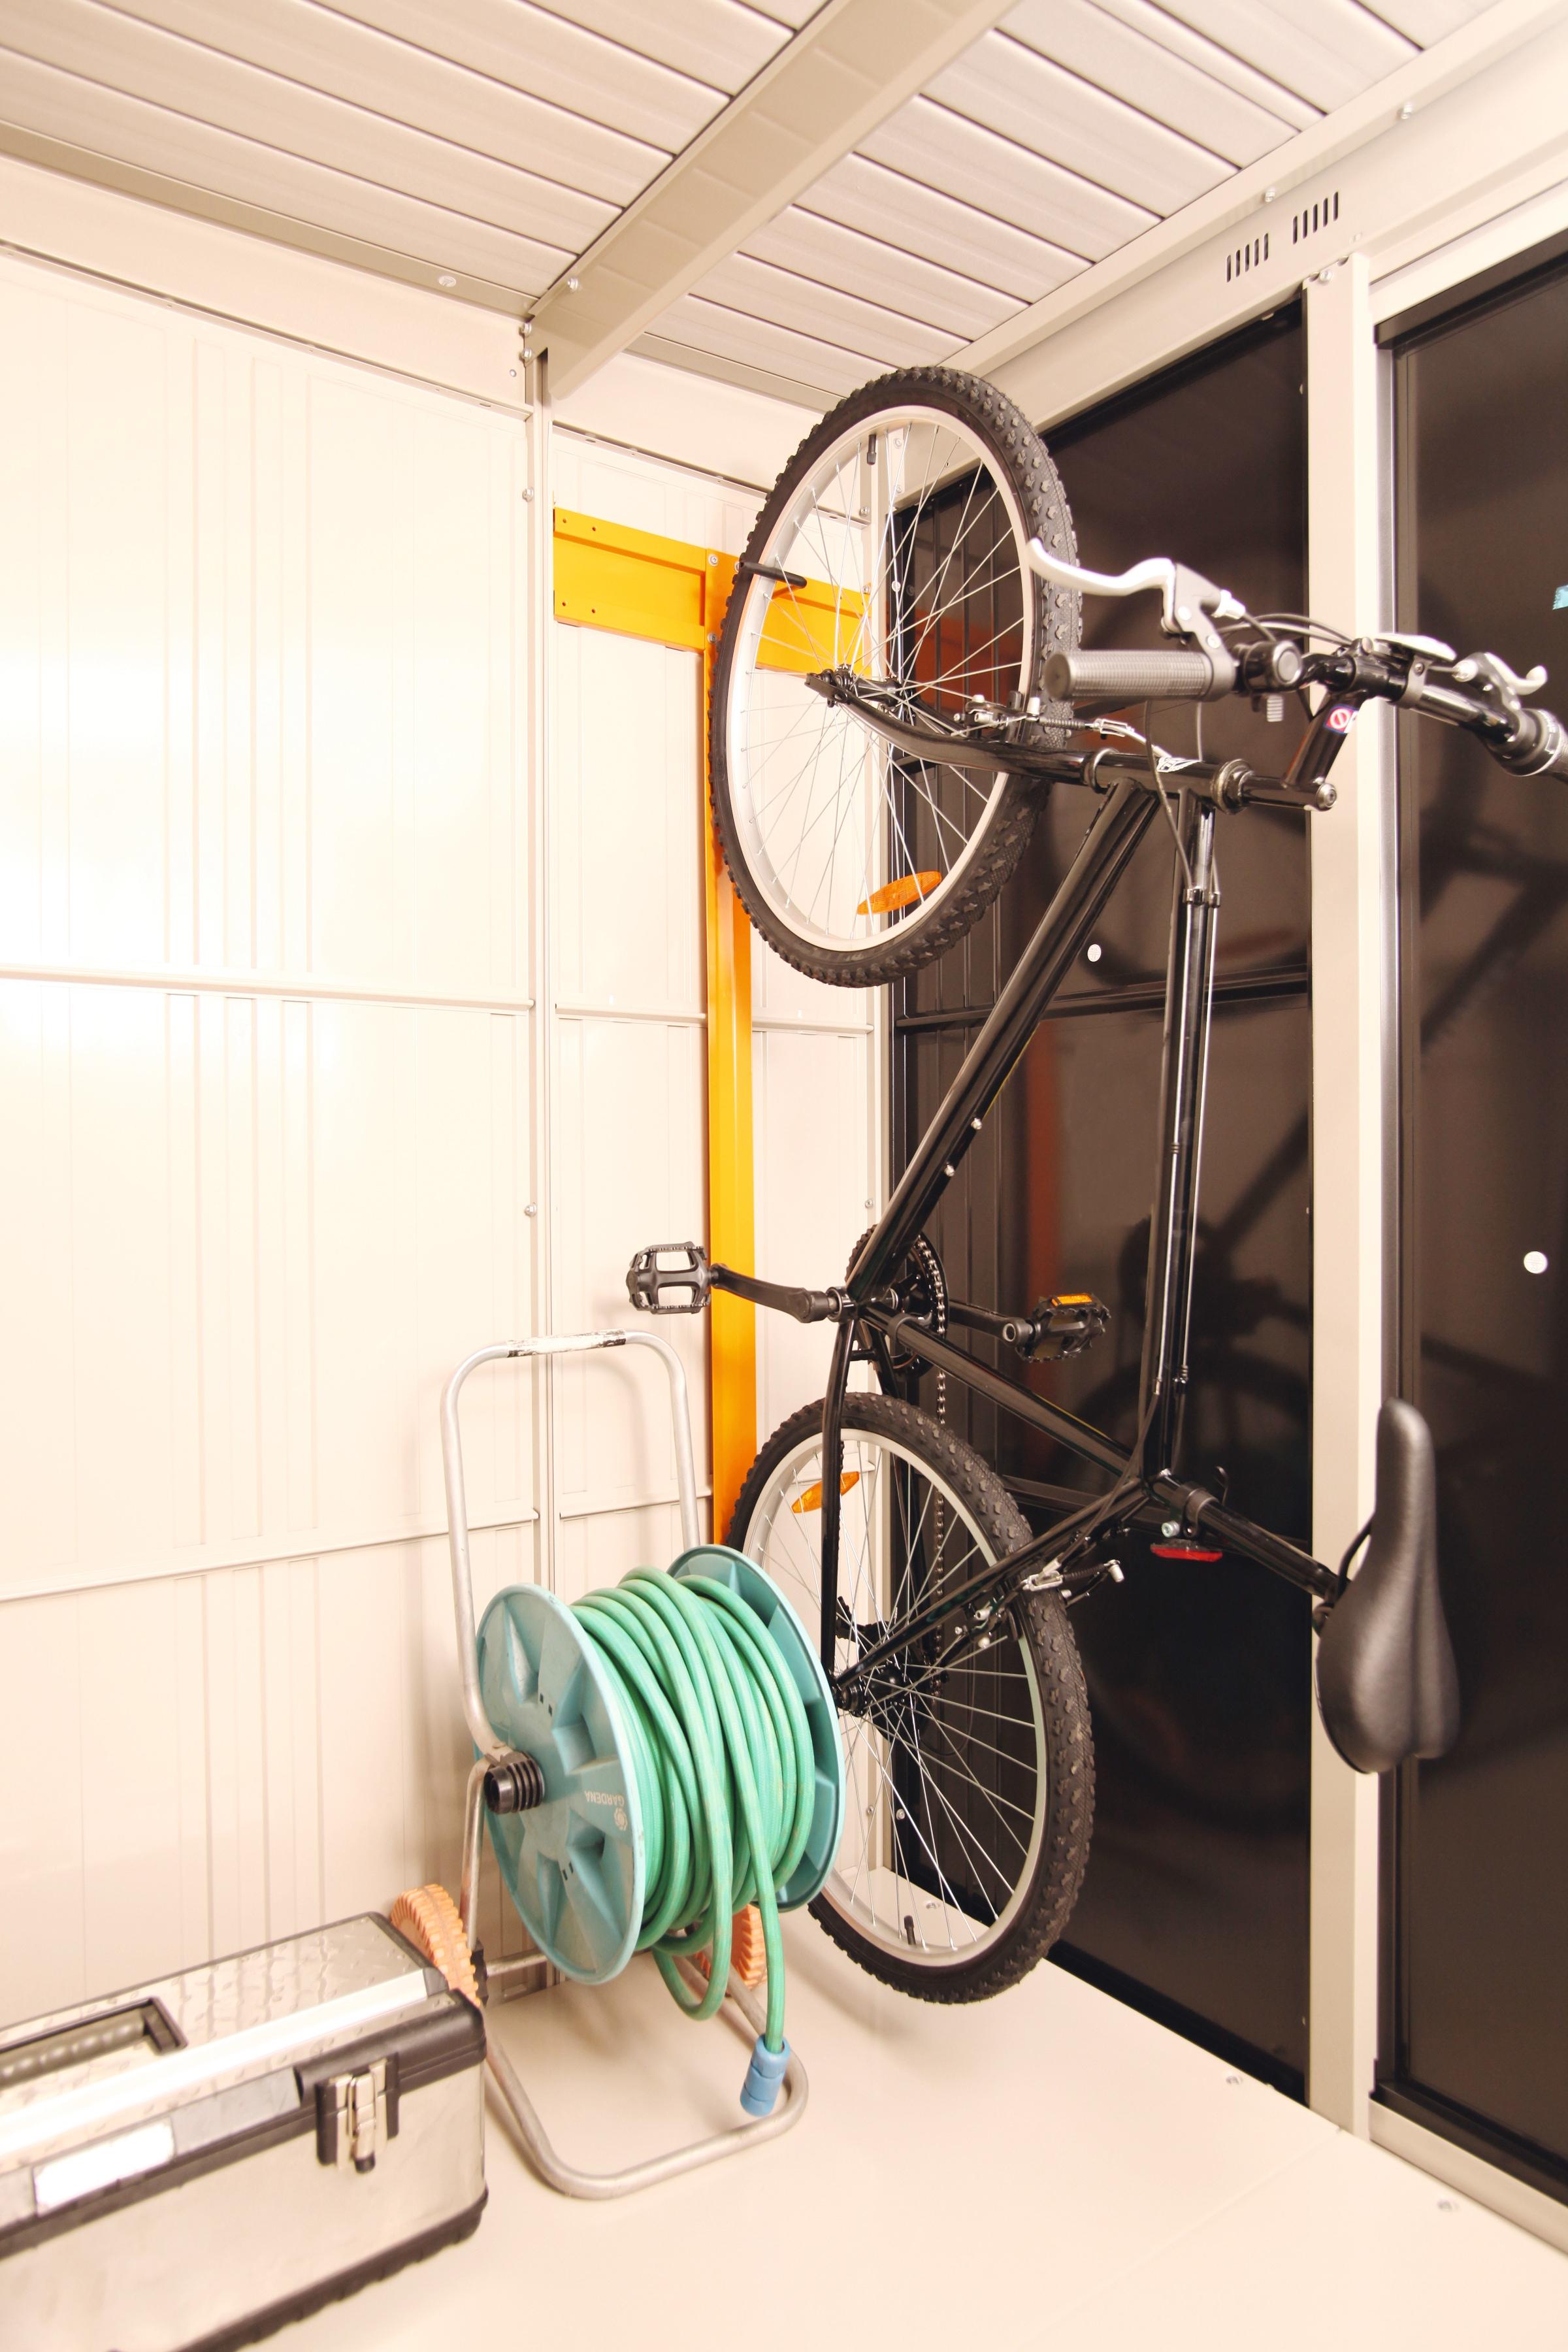 Wolff Fahrradhalter, für Stahlgerätehaus Yokohama, Sapporo, Nagoya, Osaka orange Fahrradhalter